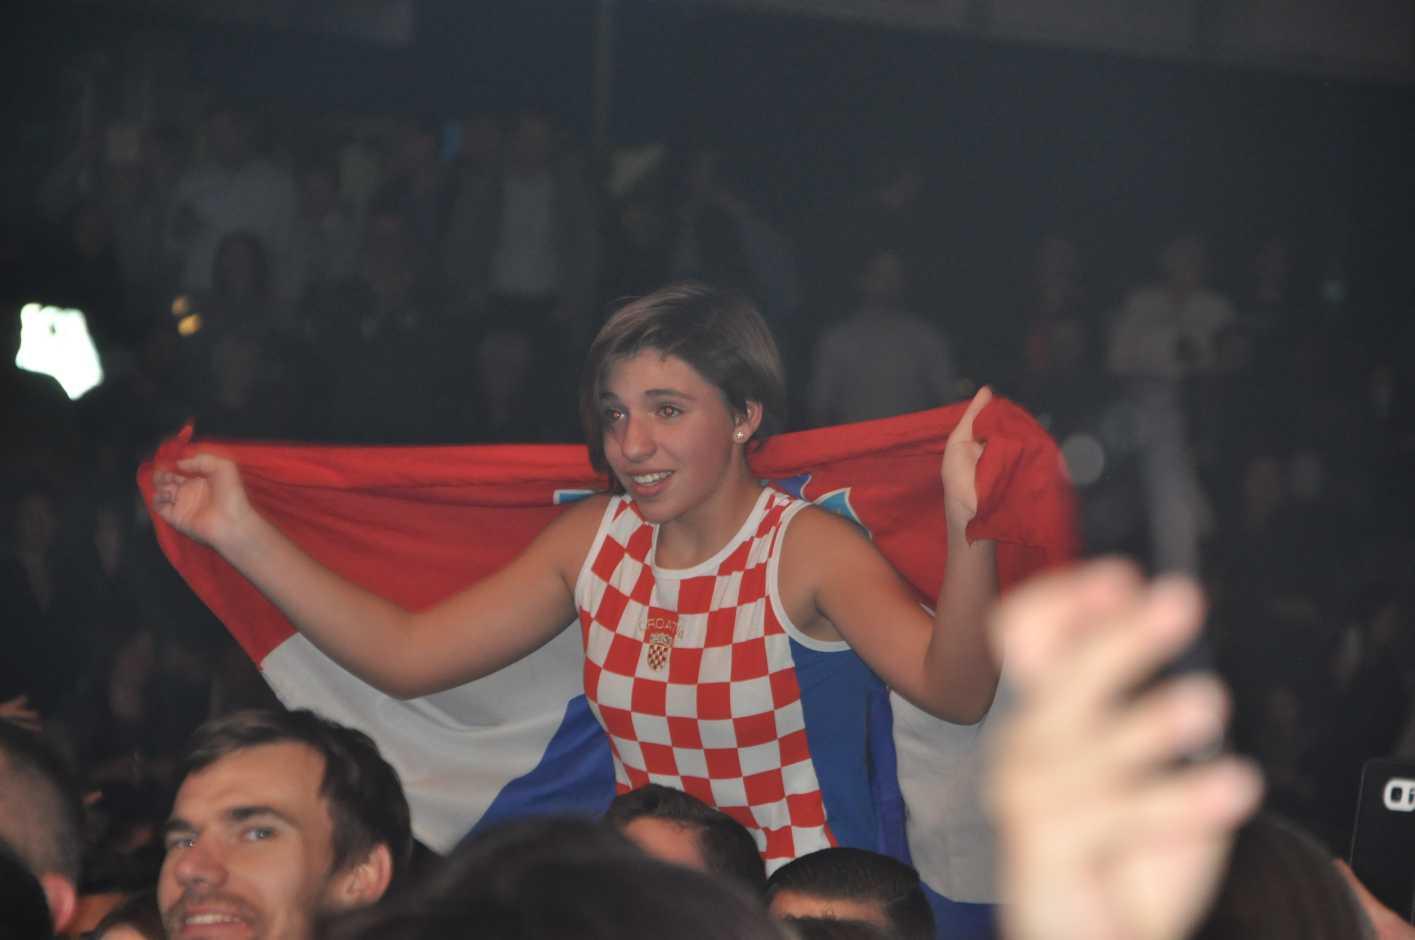 hrvatska-noc-2016-57